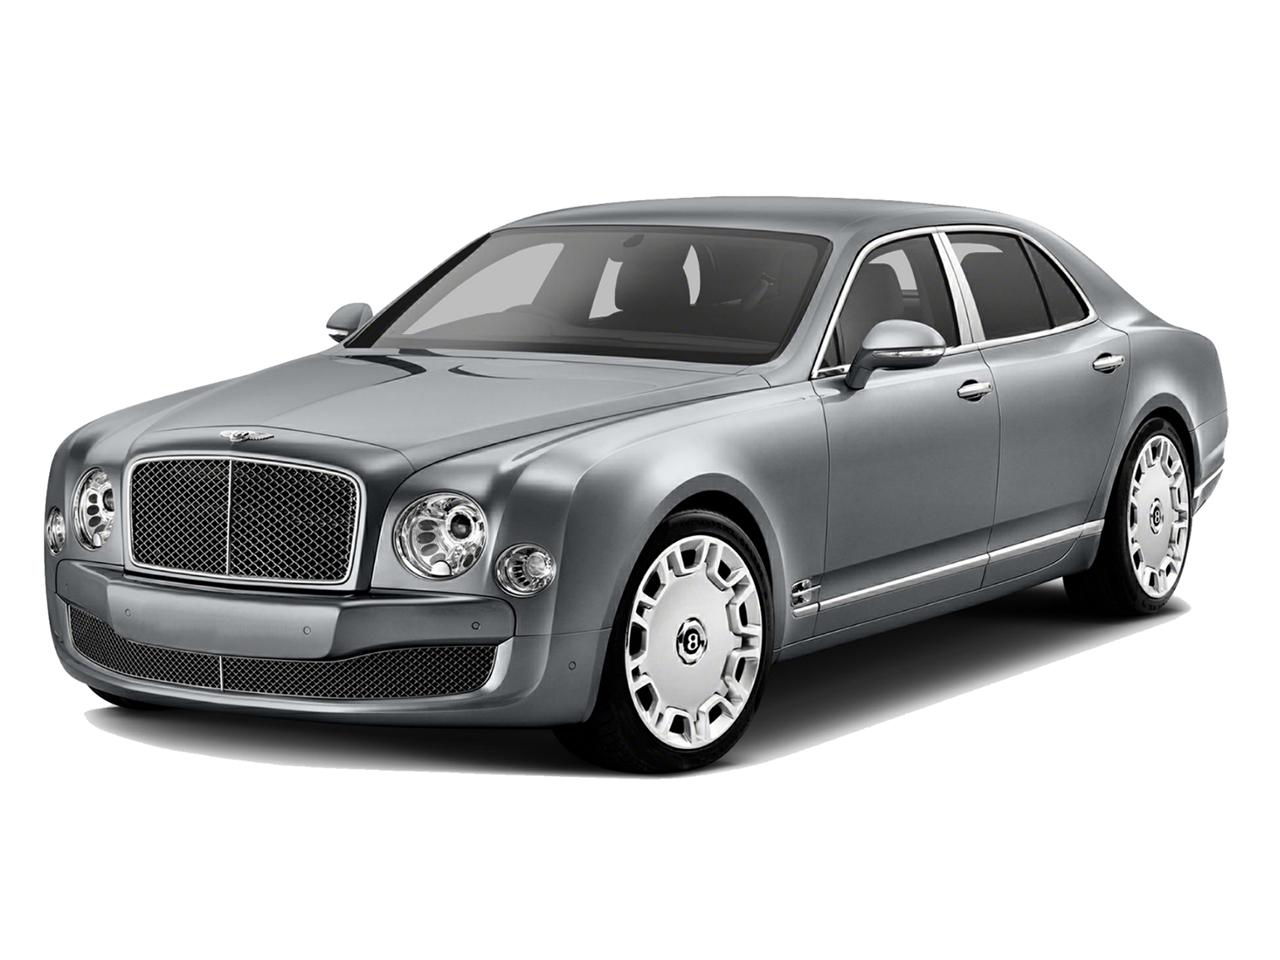 2018 Bentley Mulsanne Prices In UAE, Gulf Specs & Reviews